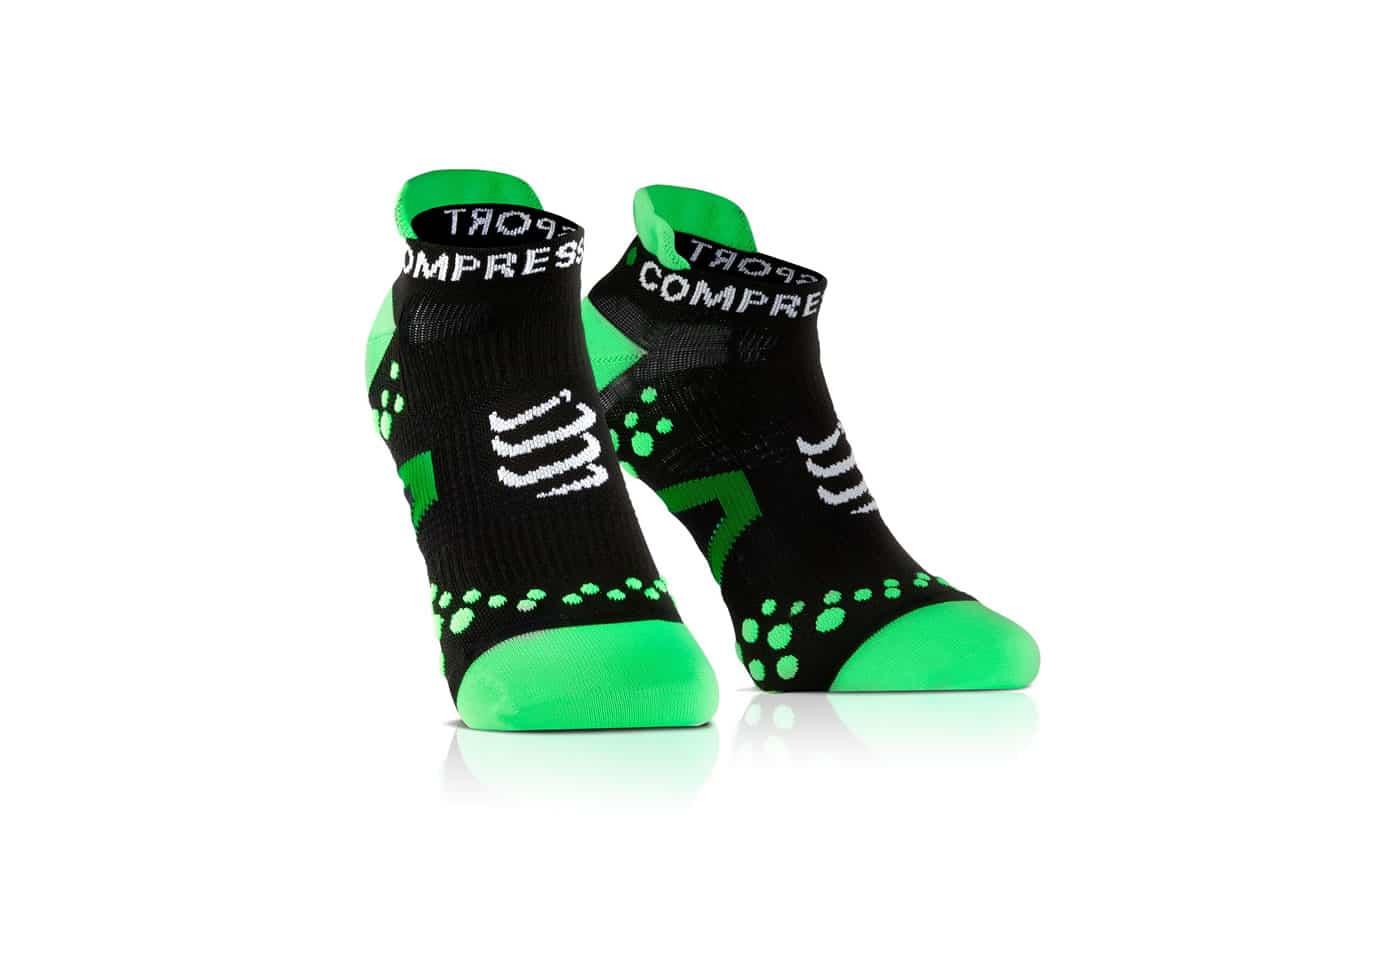 Calcetines Bajos Compressport Proracing Socks V2_1 negro-verde